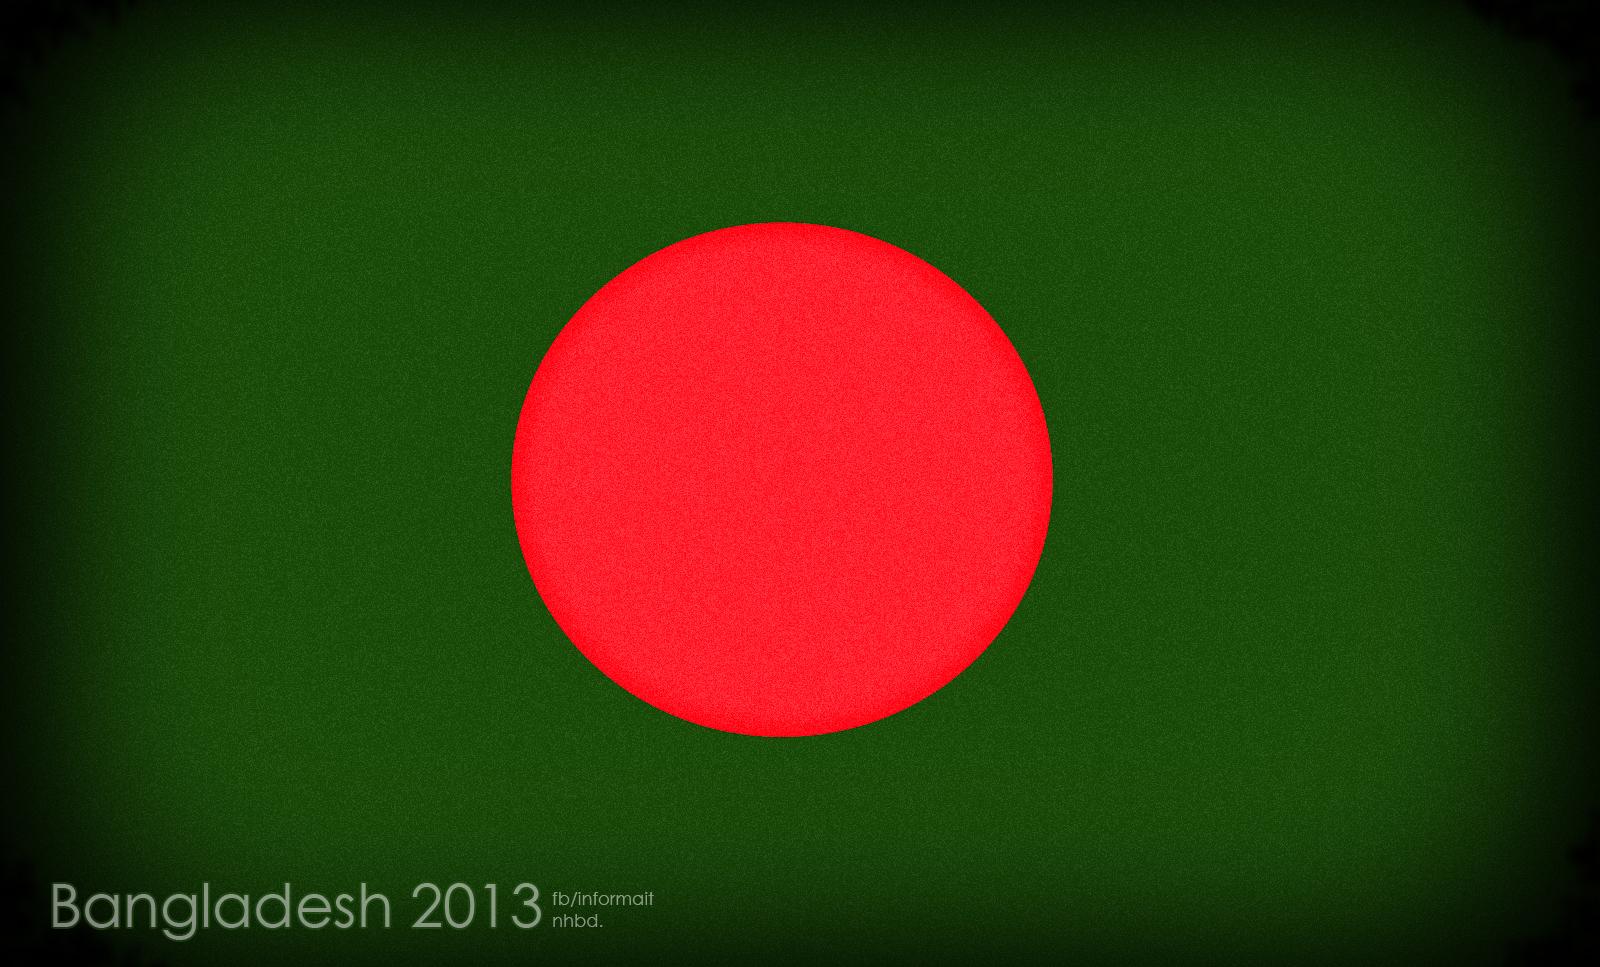 bangladesh wallpaper 2014 - photo #48